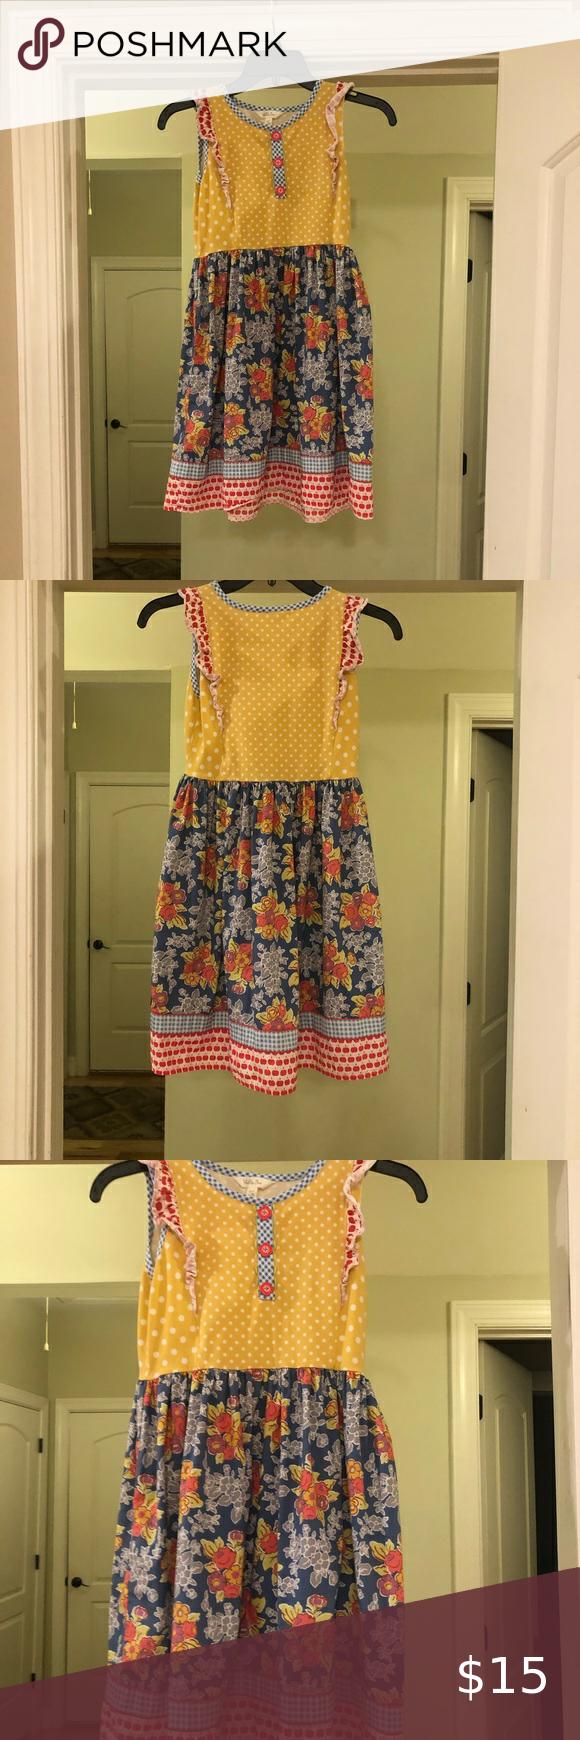 Matilda Jane Dress Jane Dress Girls Dresses Size 12 Dresses [ 1740 x 580 Pixel ]